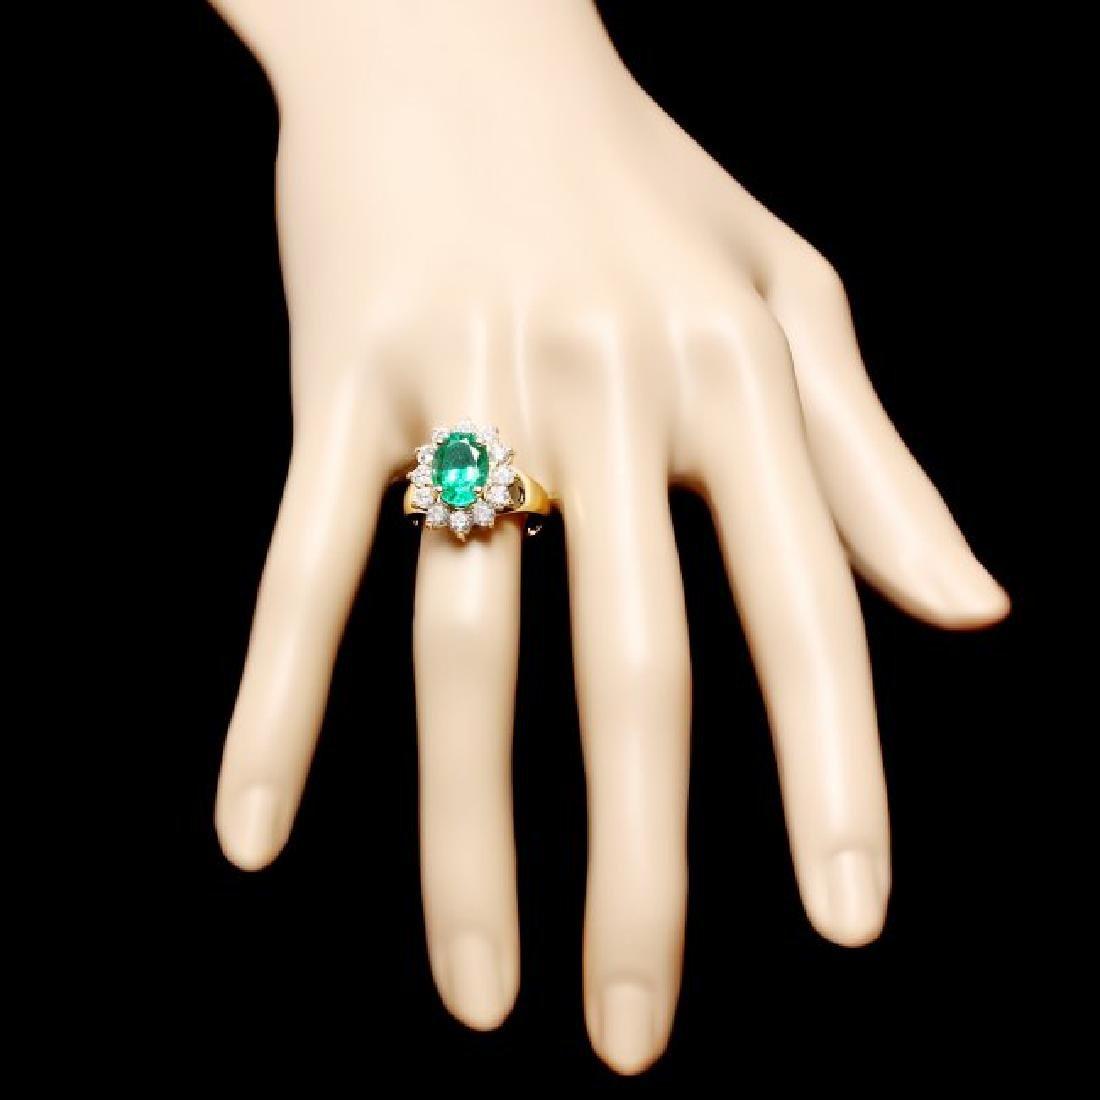 14k Gold 2.70ct Emerald 1.30ct Diamond Ring - 4